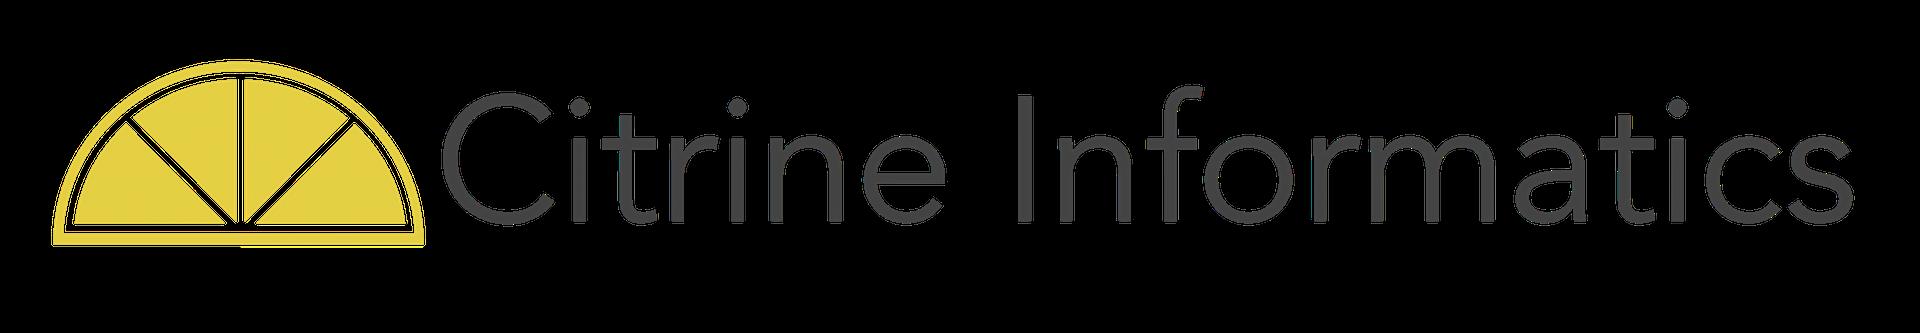 Citrine Informatics